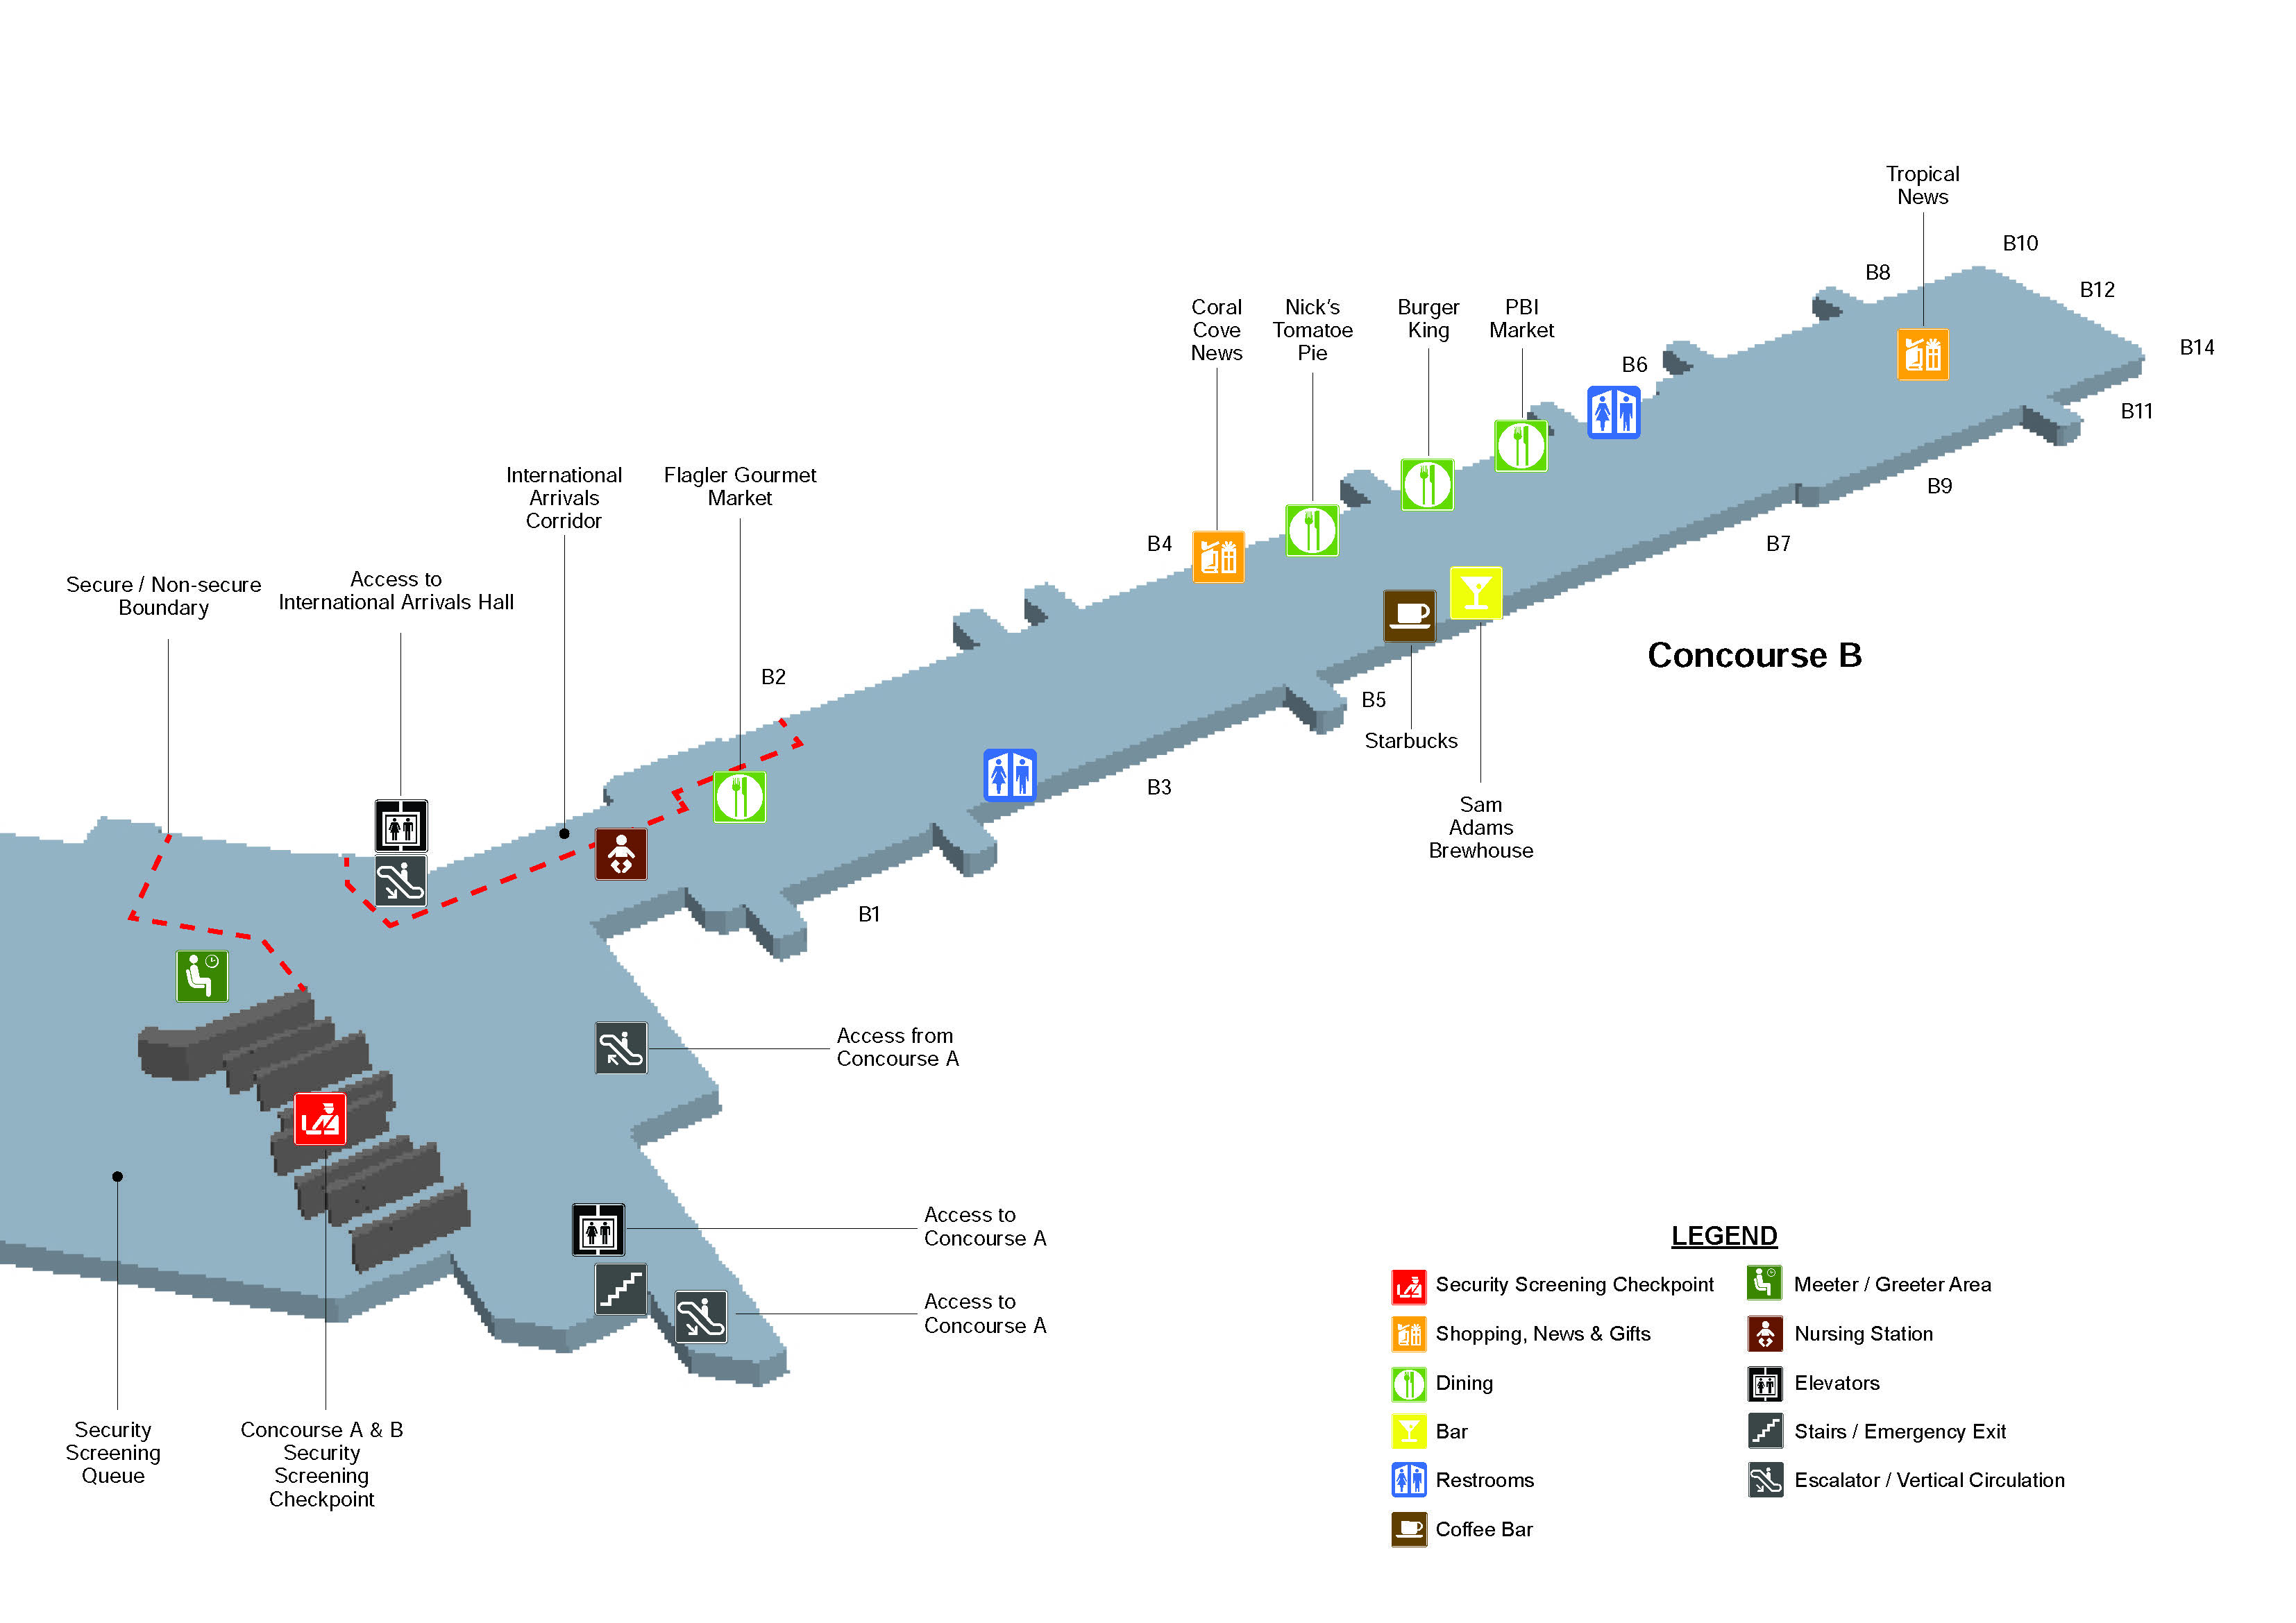 Terminal Maps | Palm Beach International Airport